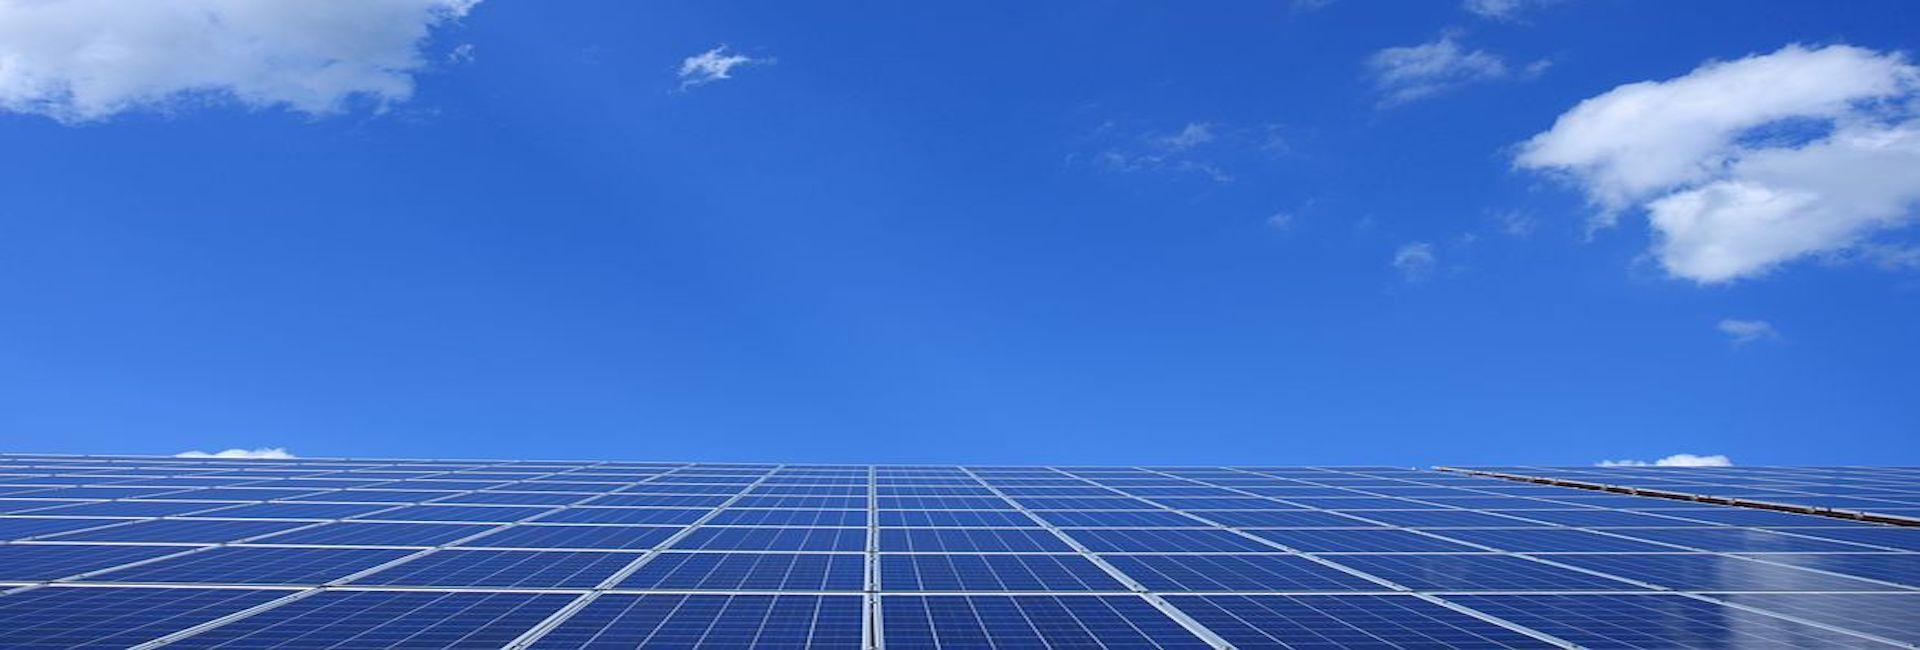 solar-energy-2157212__480